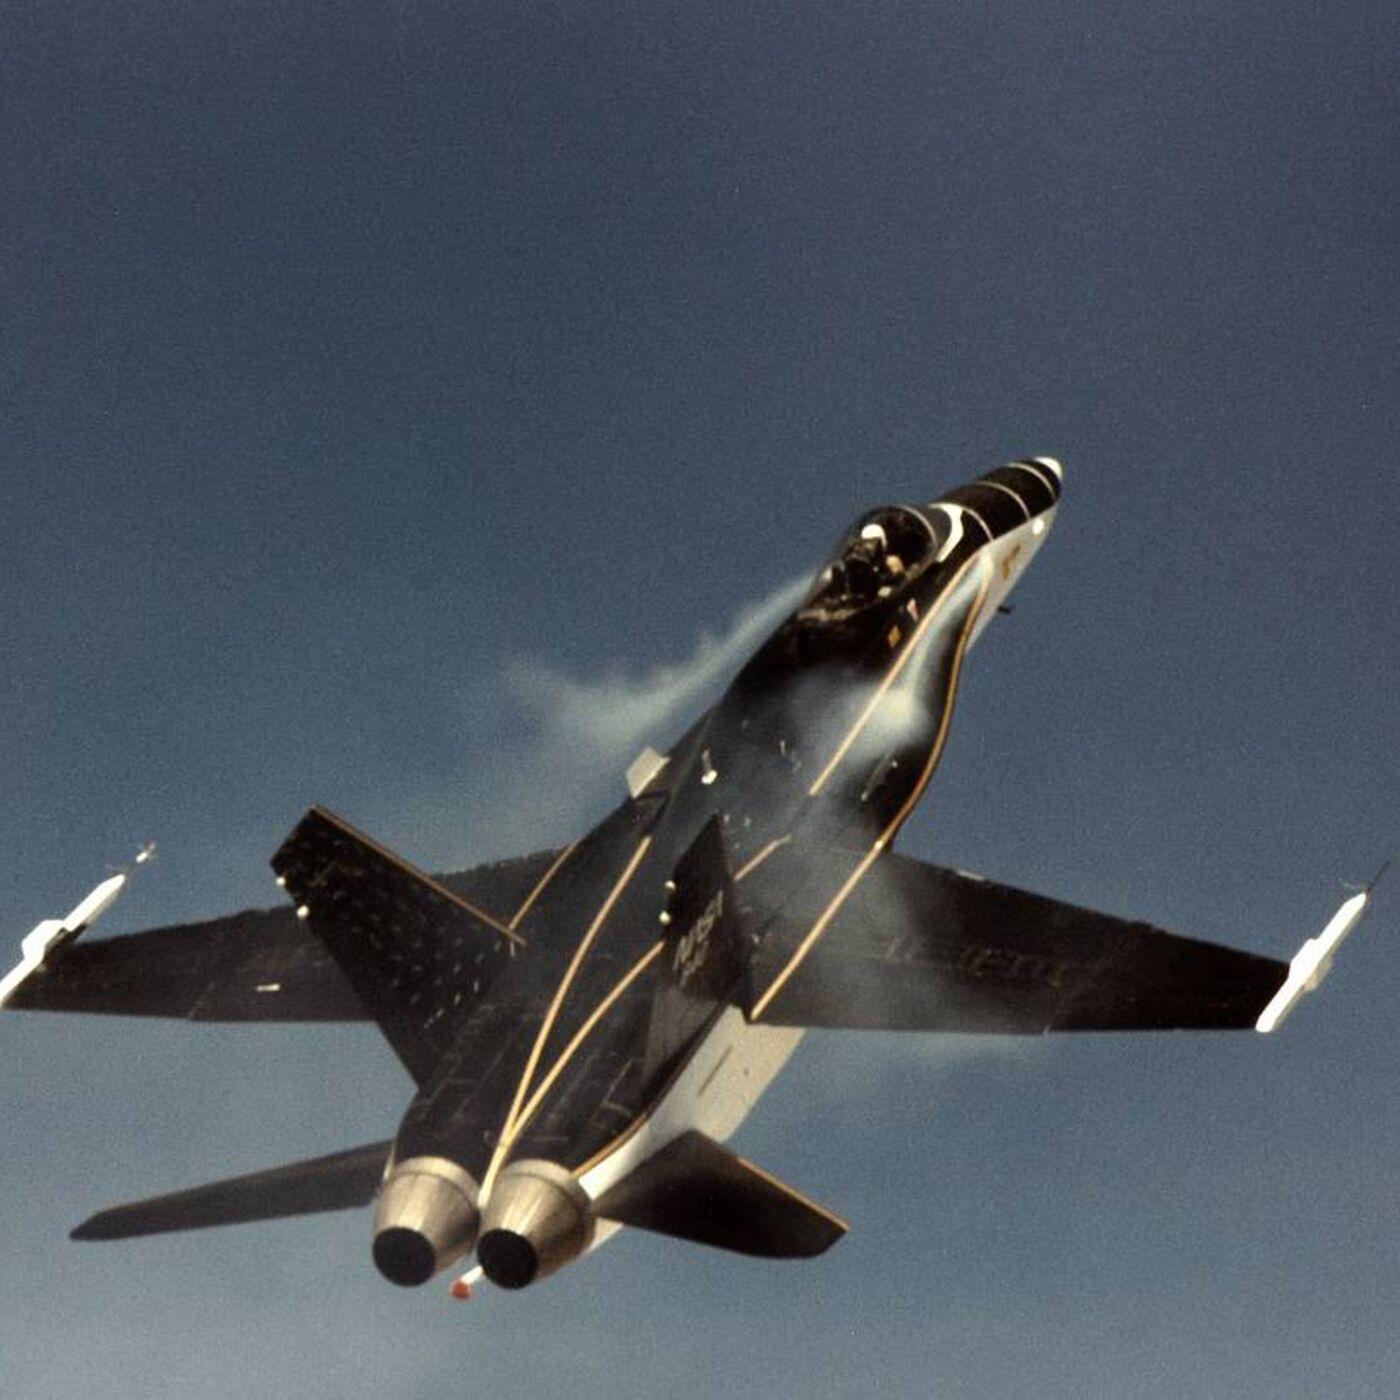 Thrust Vectoring F-18, the HARV project